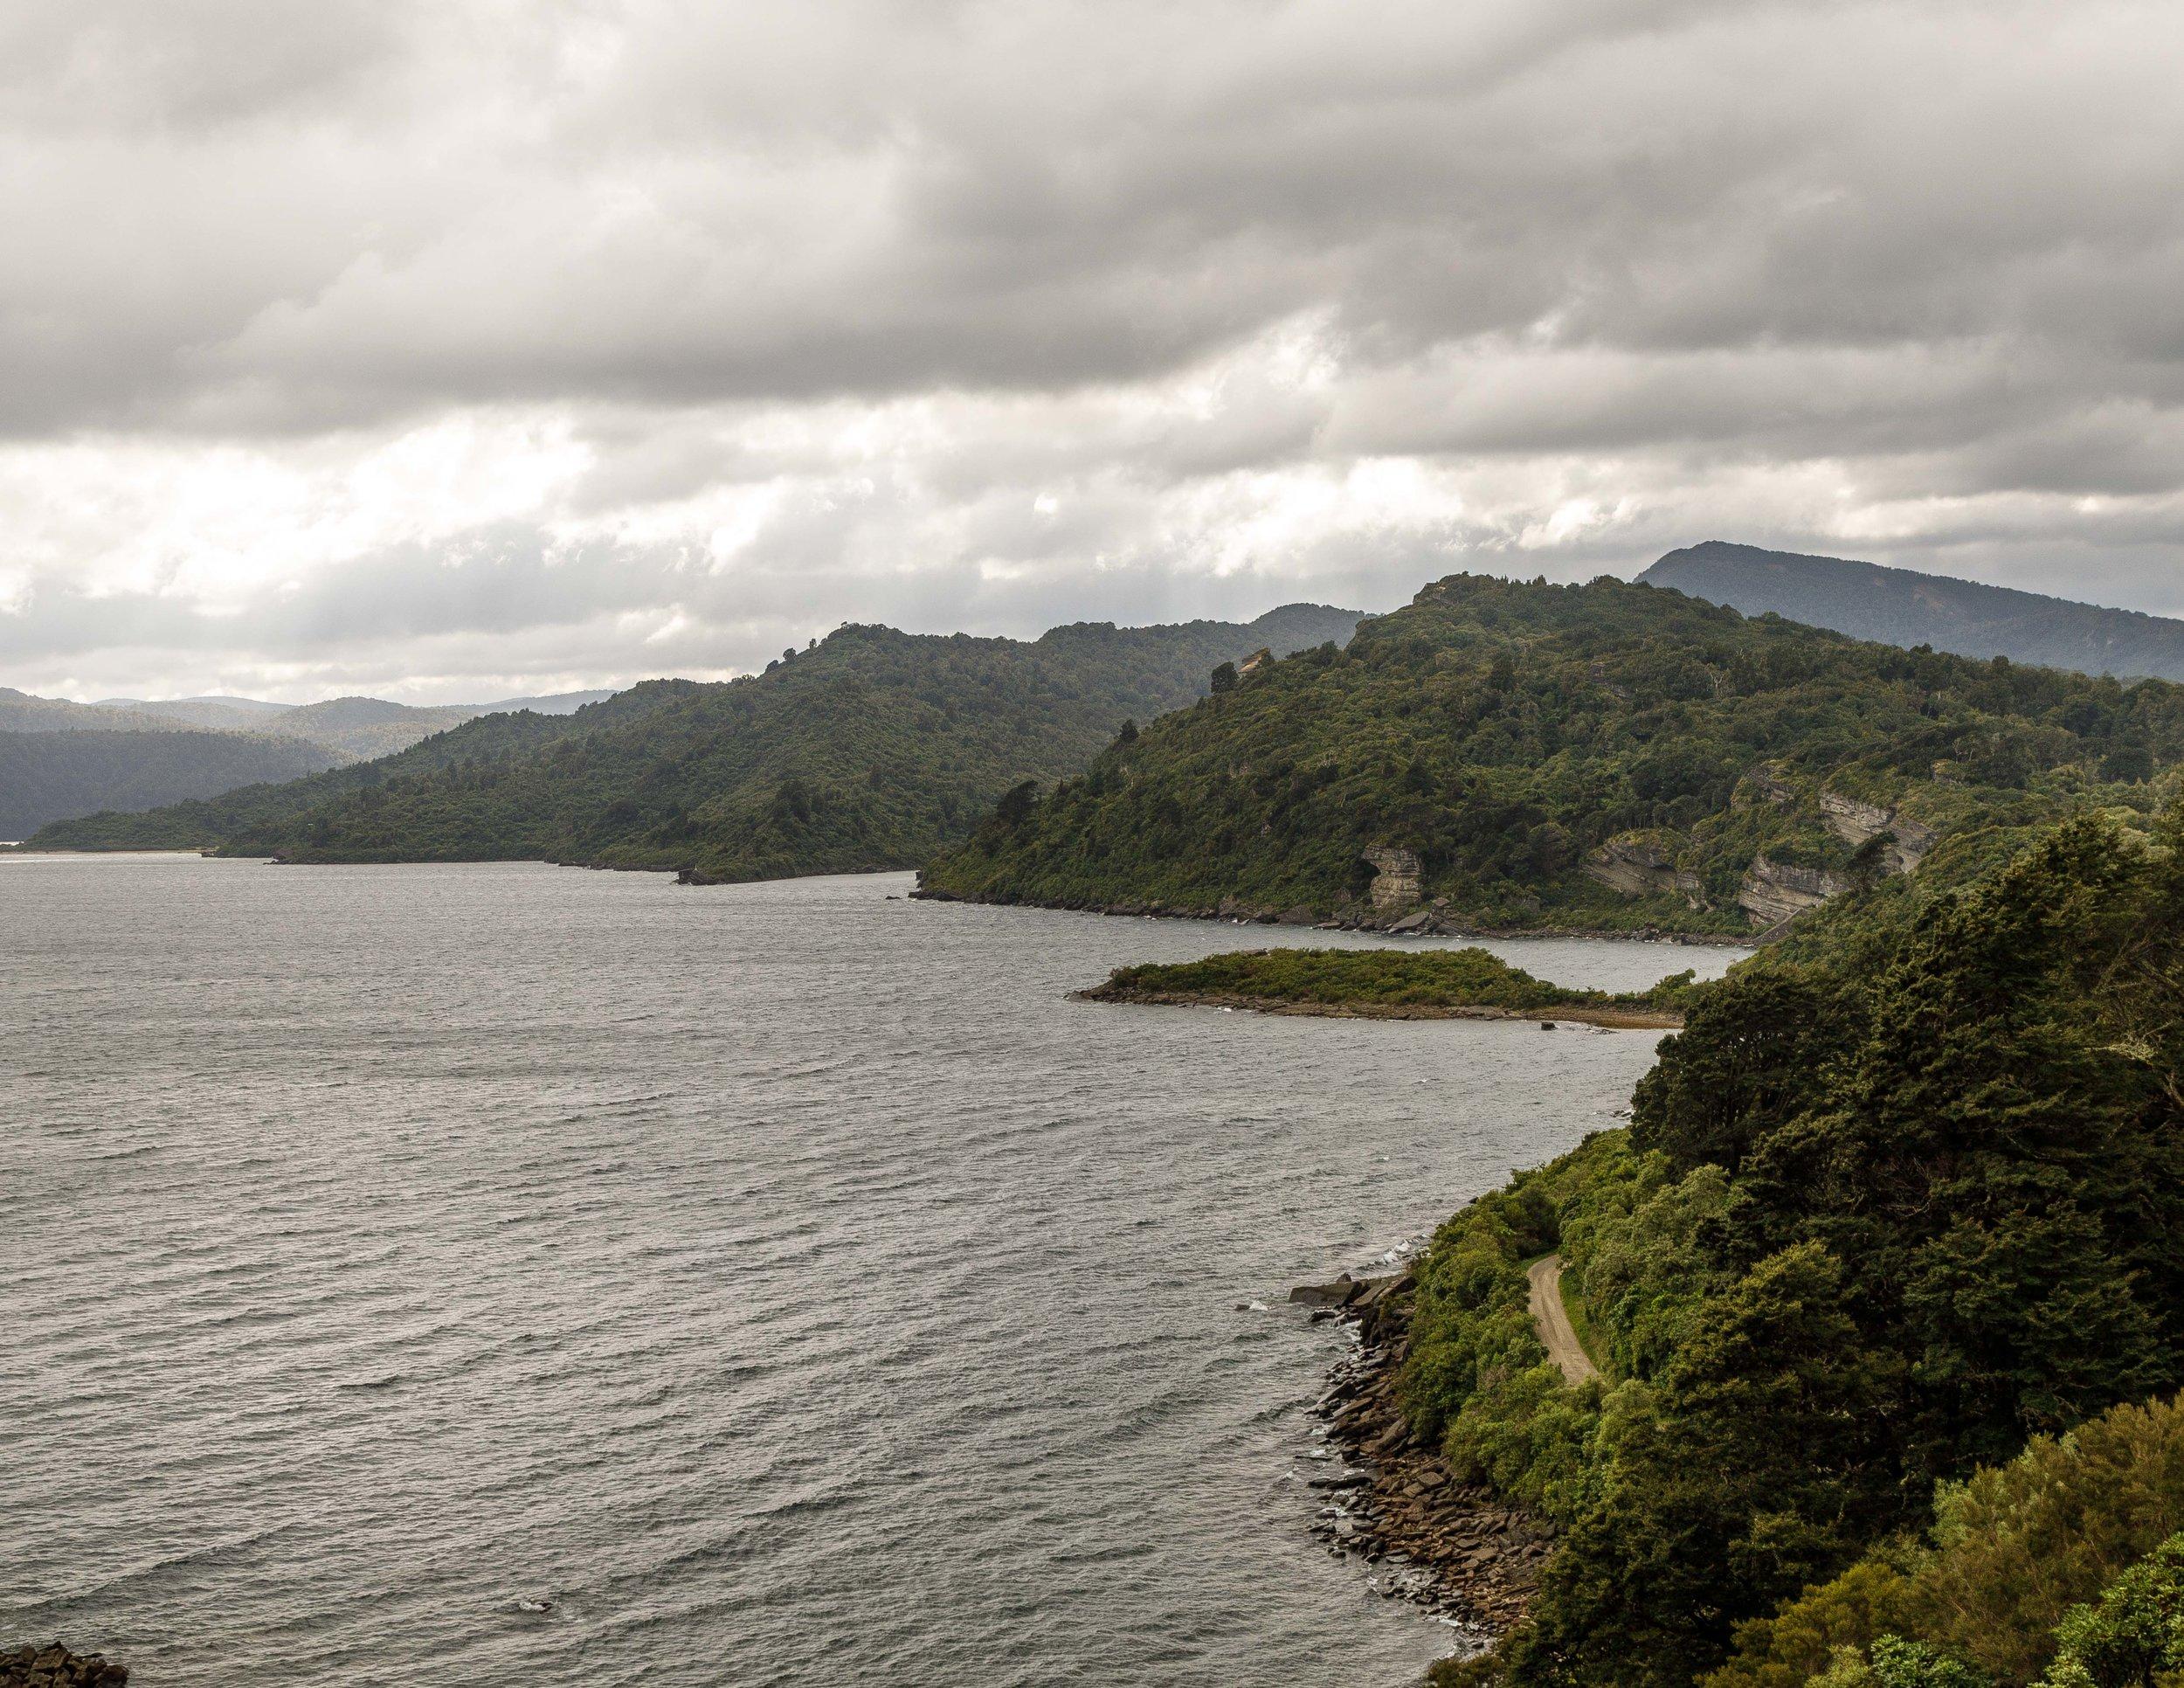 The view on the ridge on Lake Waikaremoana